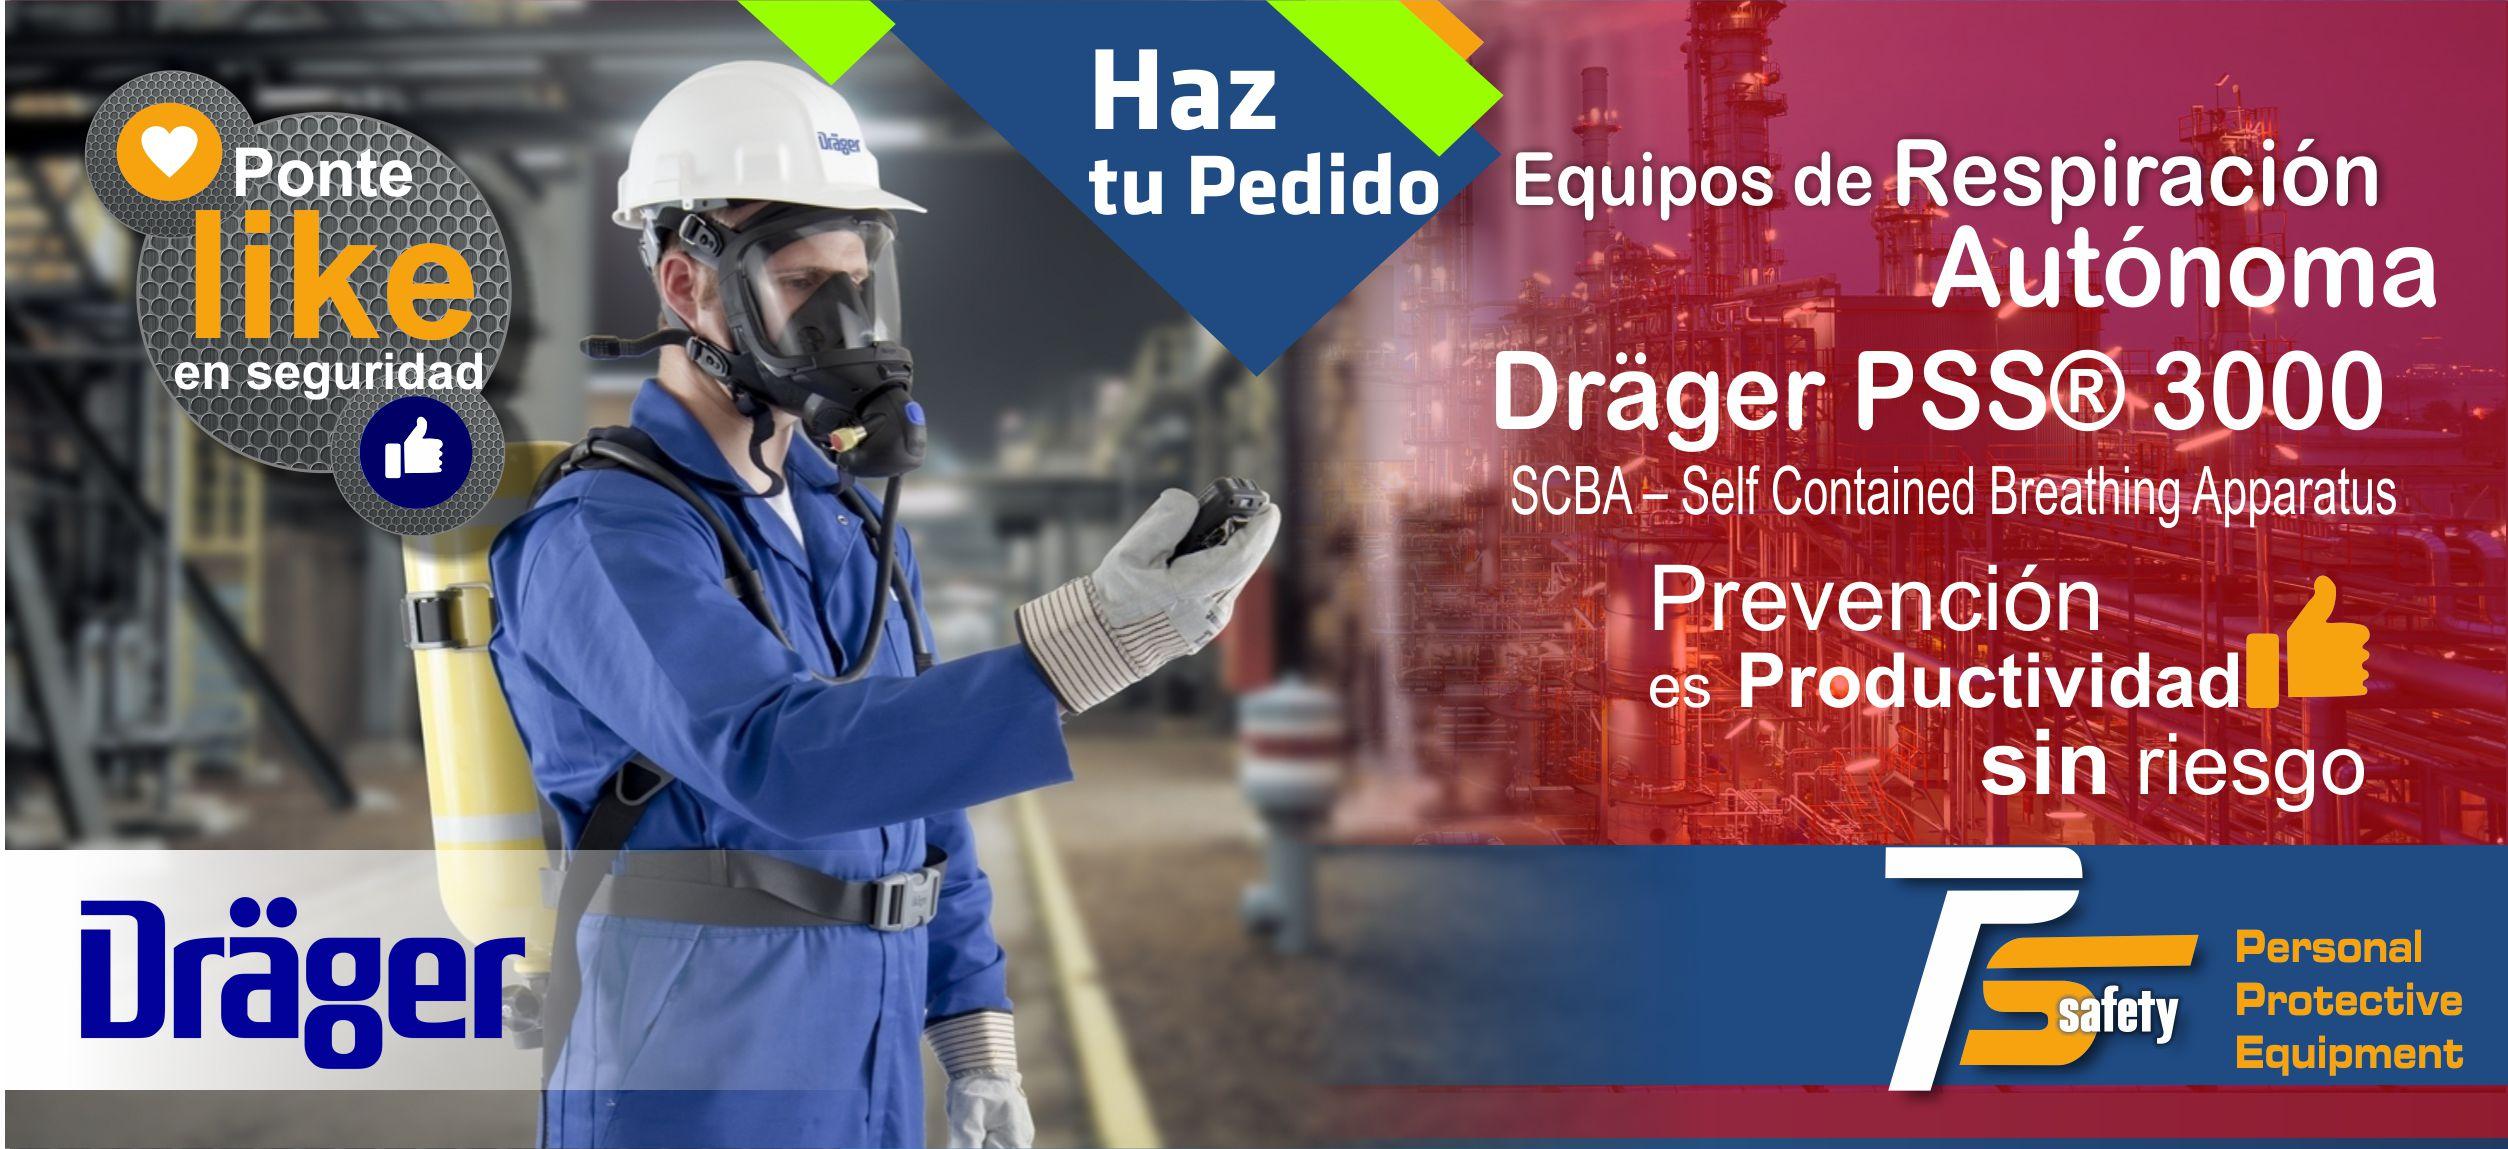 Drager PSS3000 Equipo de Respiracion Autonoma 30 min